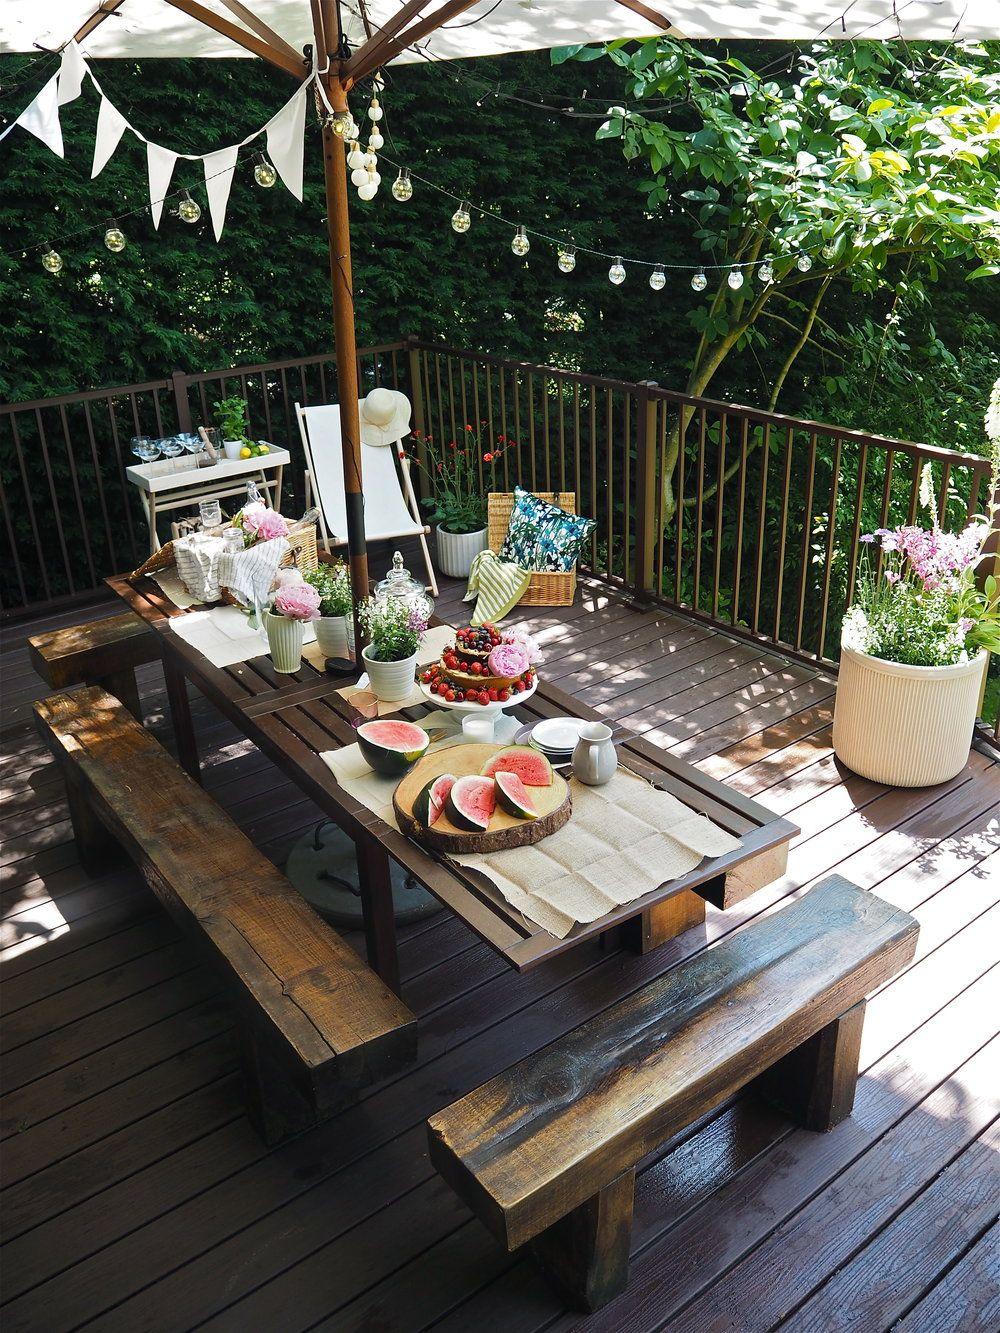 My Garden Overhaul The Trex Transcend Composite Deck Reveal Deck Design Composite Decking Wooden Garden Table